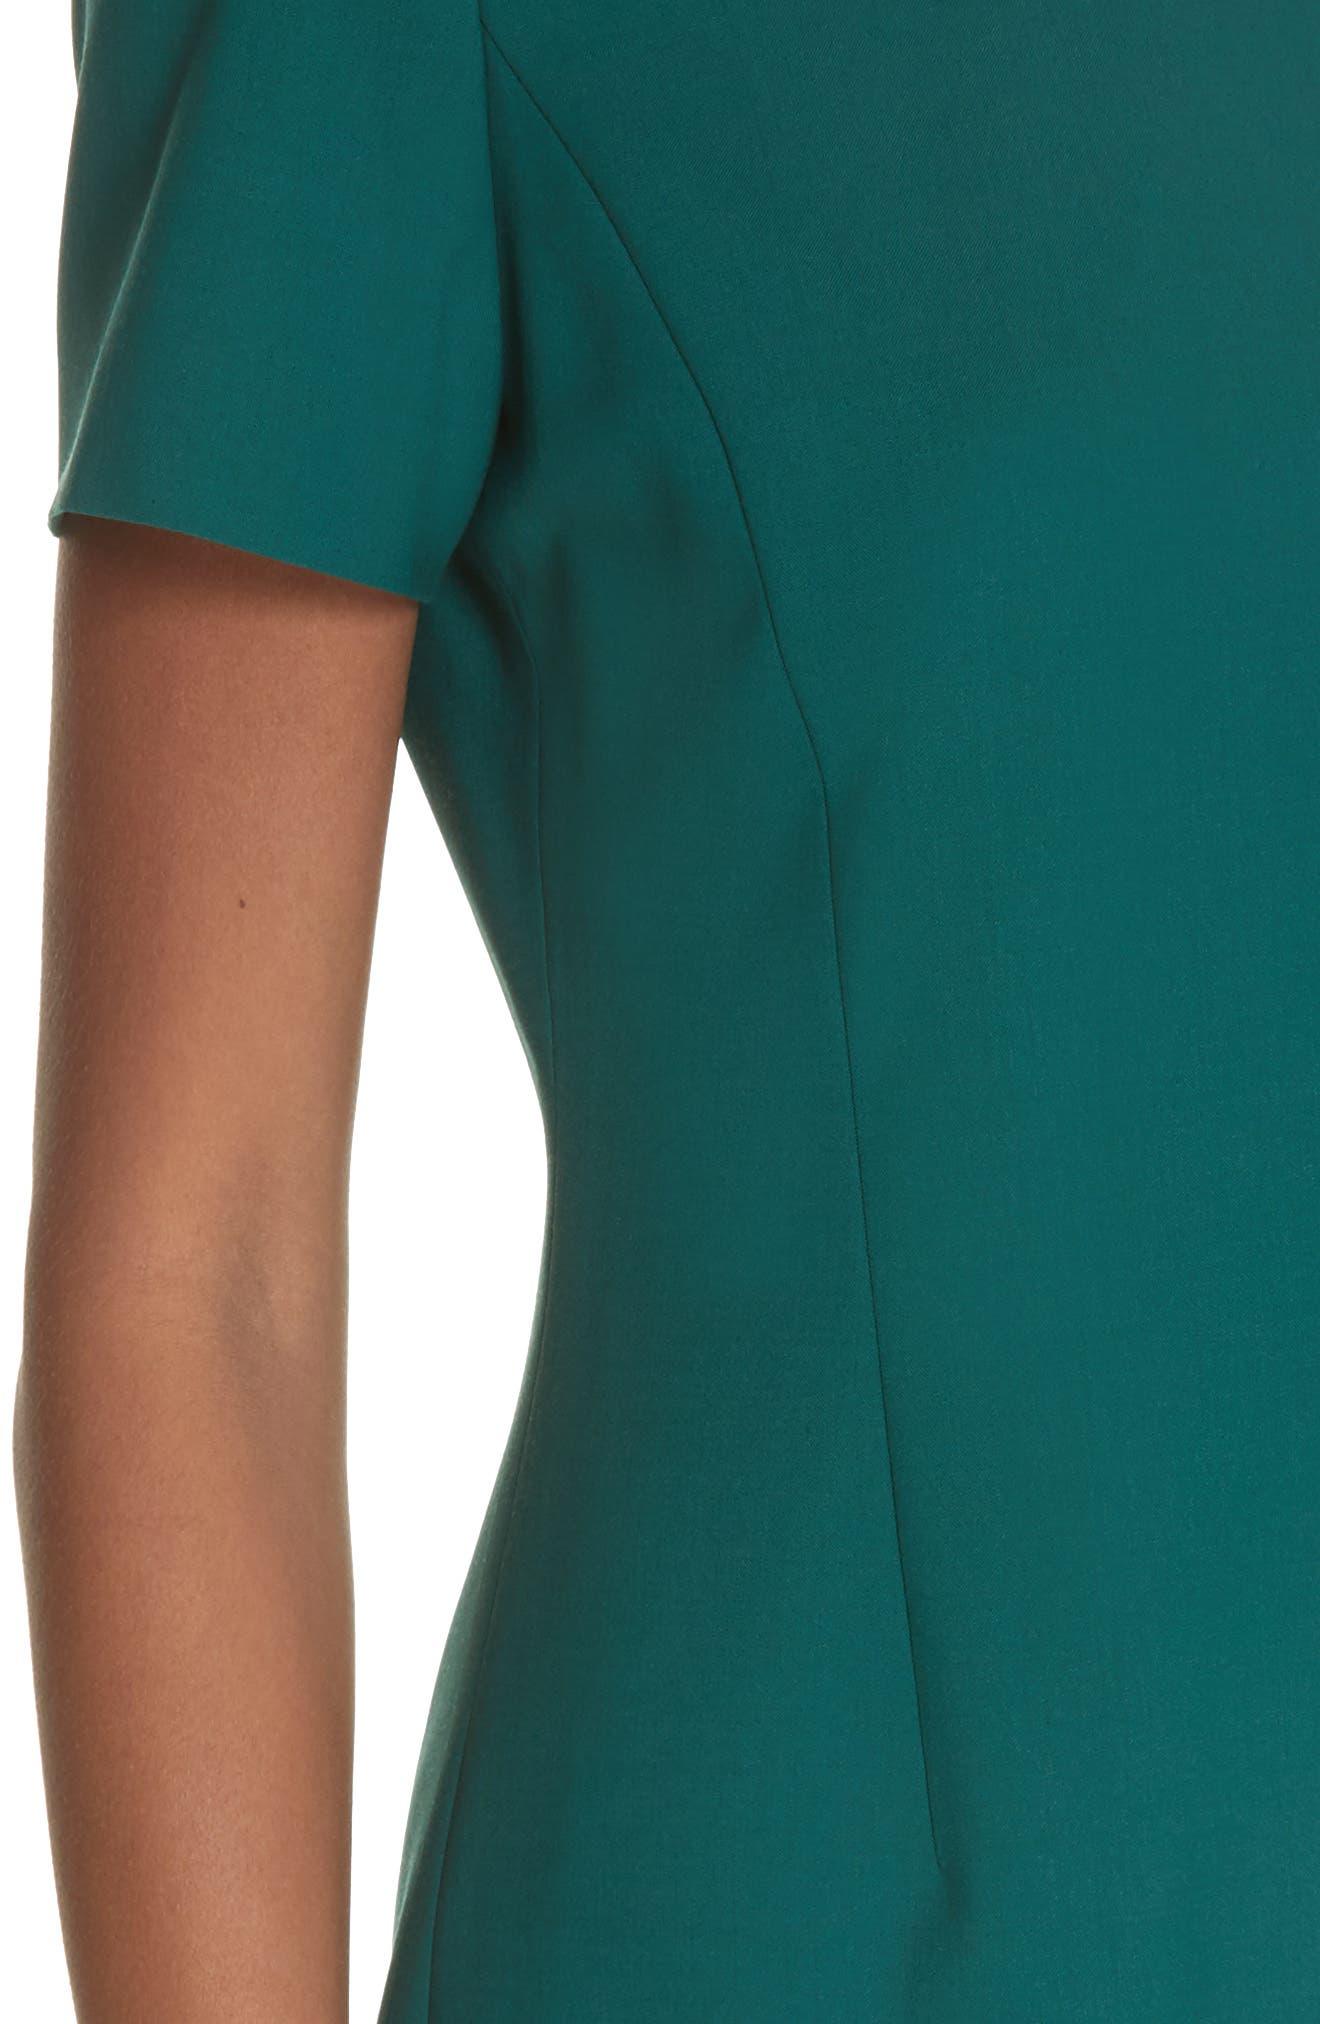 Stretch Wool A-Line Dress,                             Alternate thumbnail 4, color,                             BRIGHT POPLAR